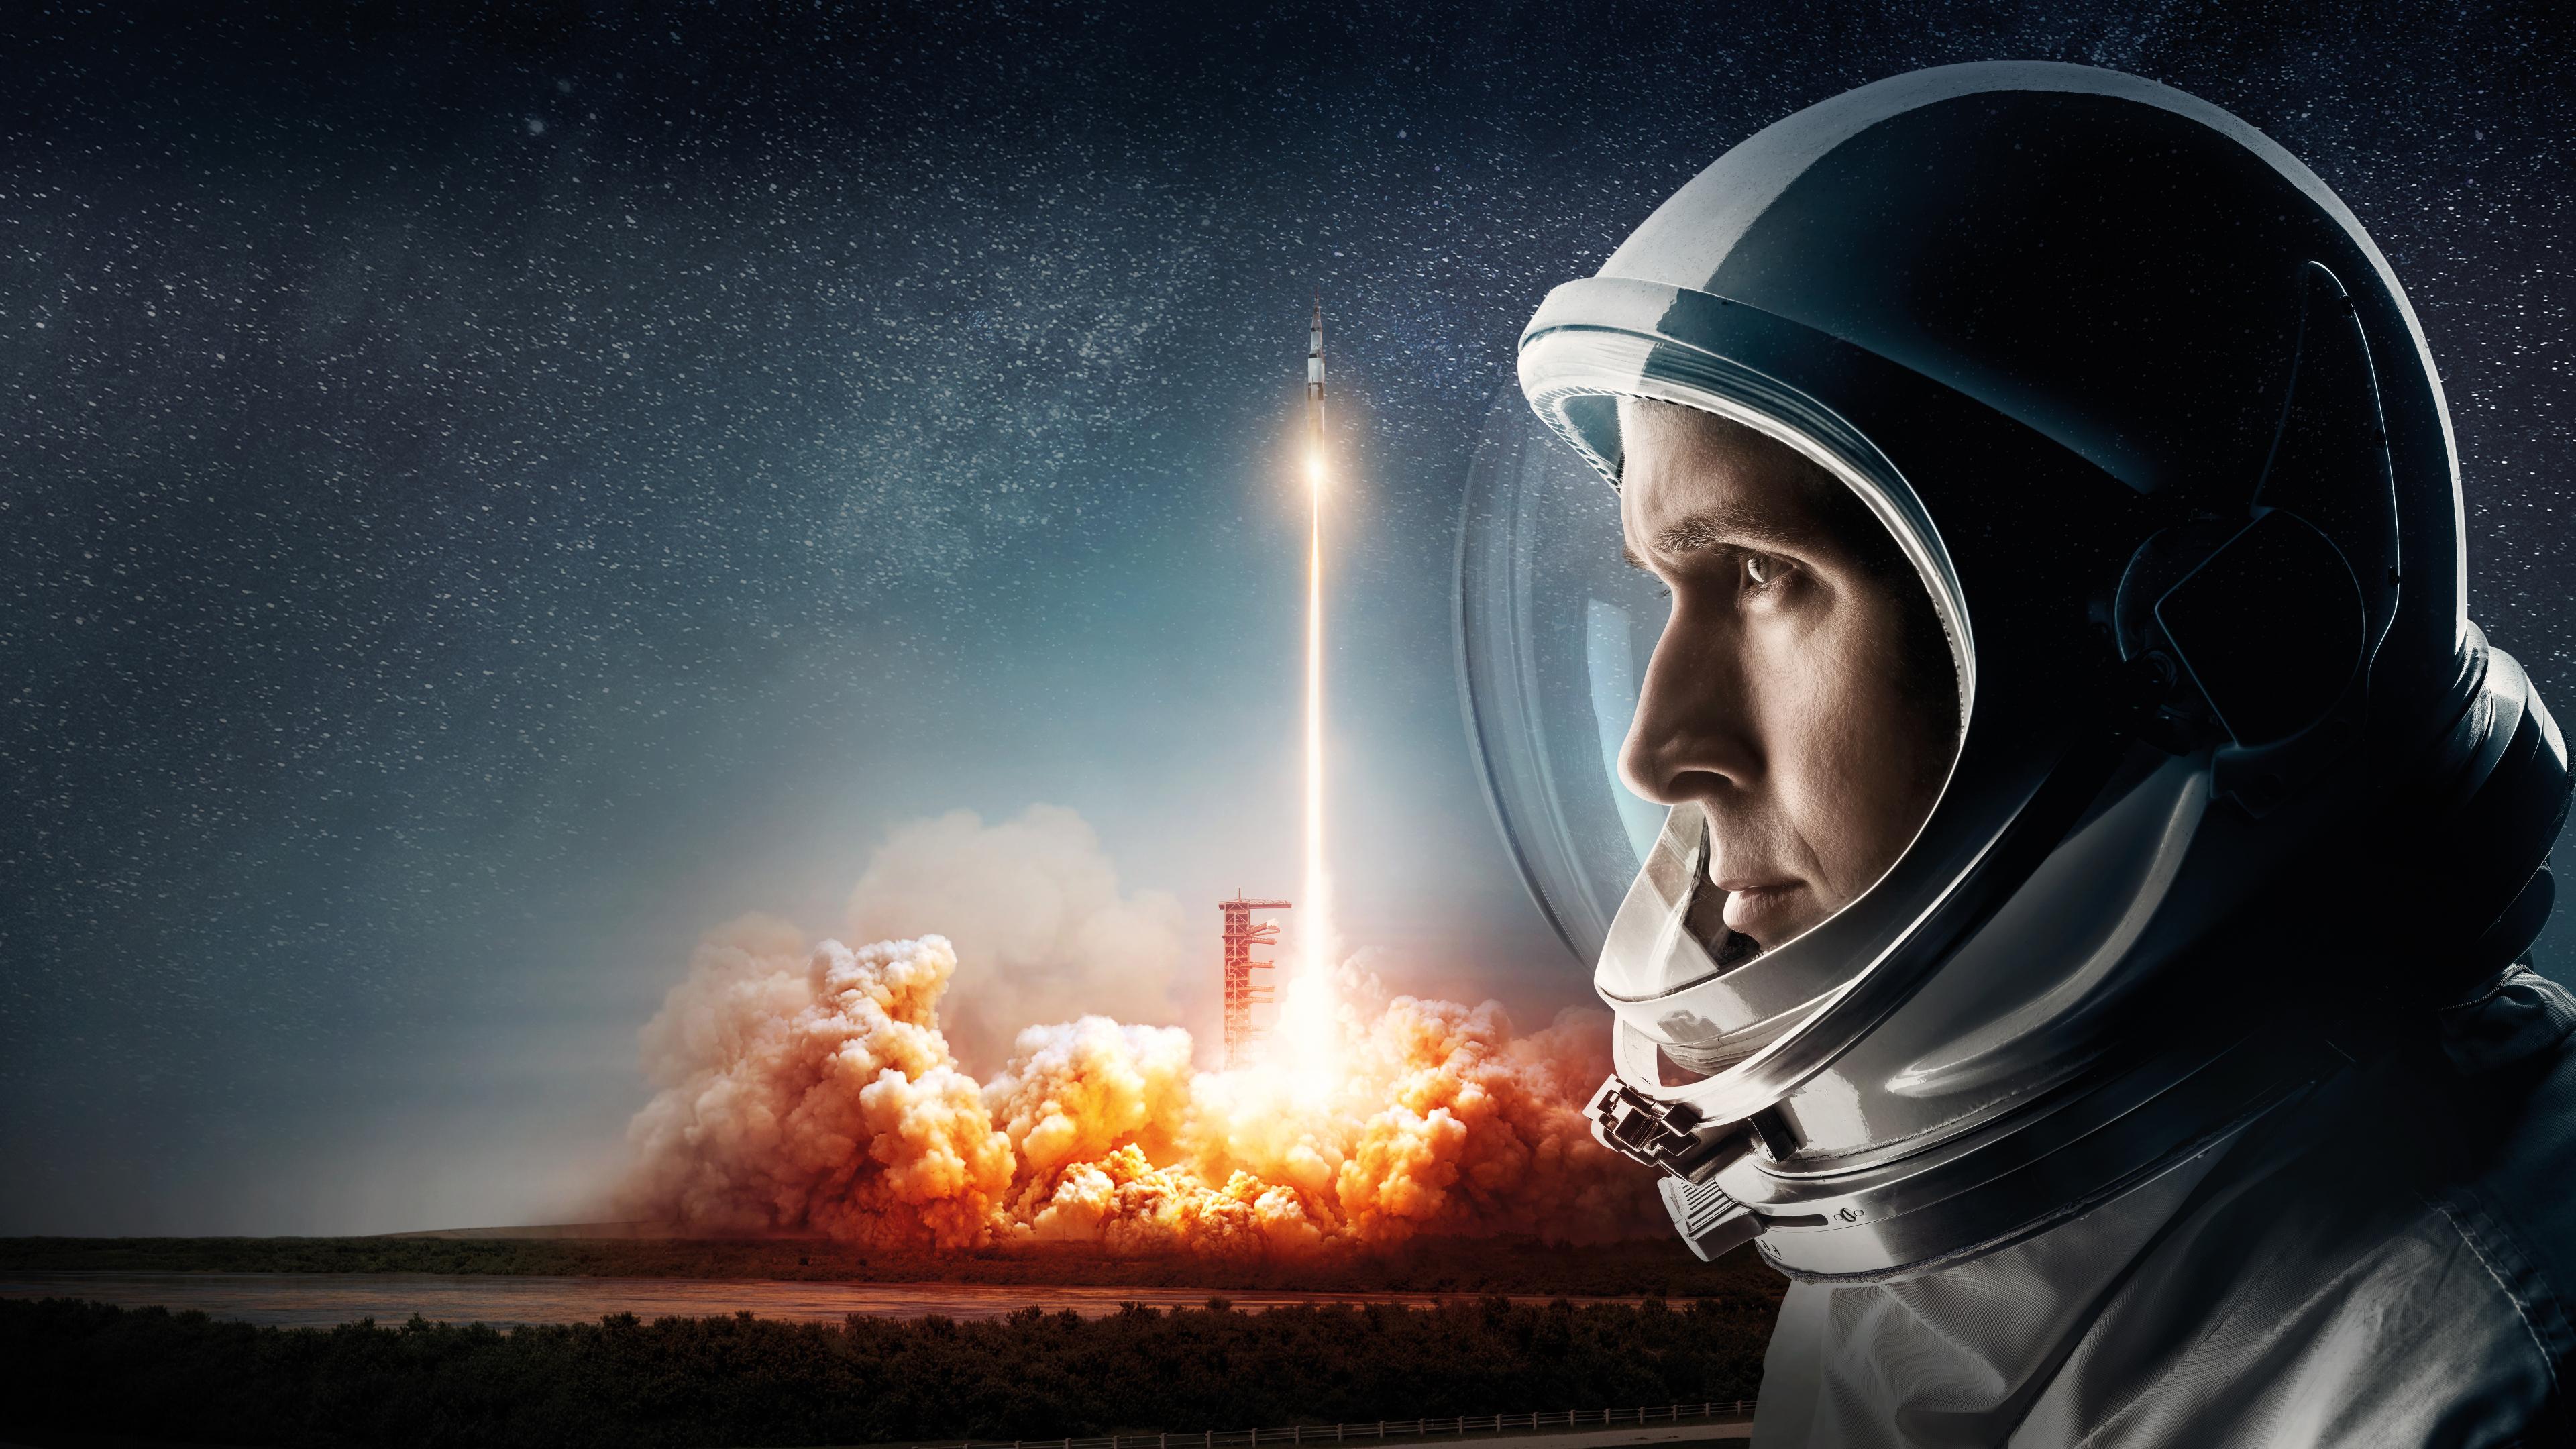 People 3840x2160 Moon space NASA astronaut spacesuit rocket stars movies